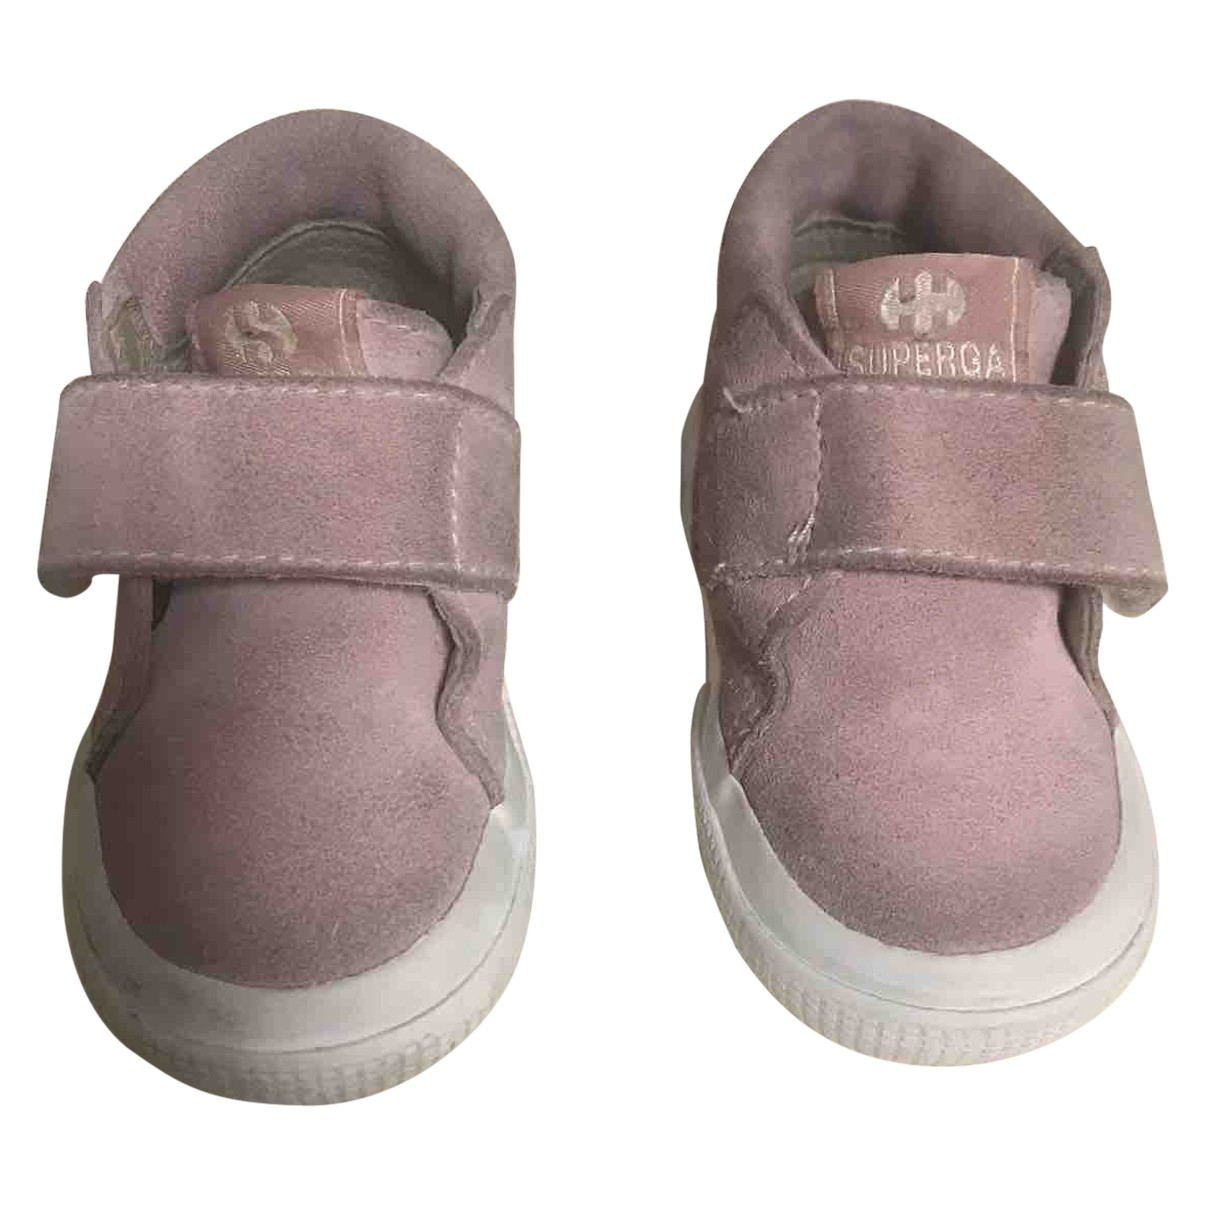 Superga N Pink Suede Boots for Kids 19 FR